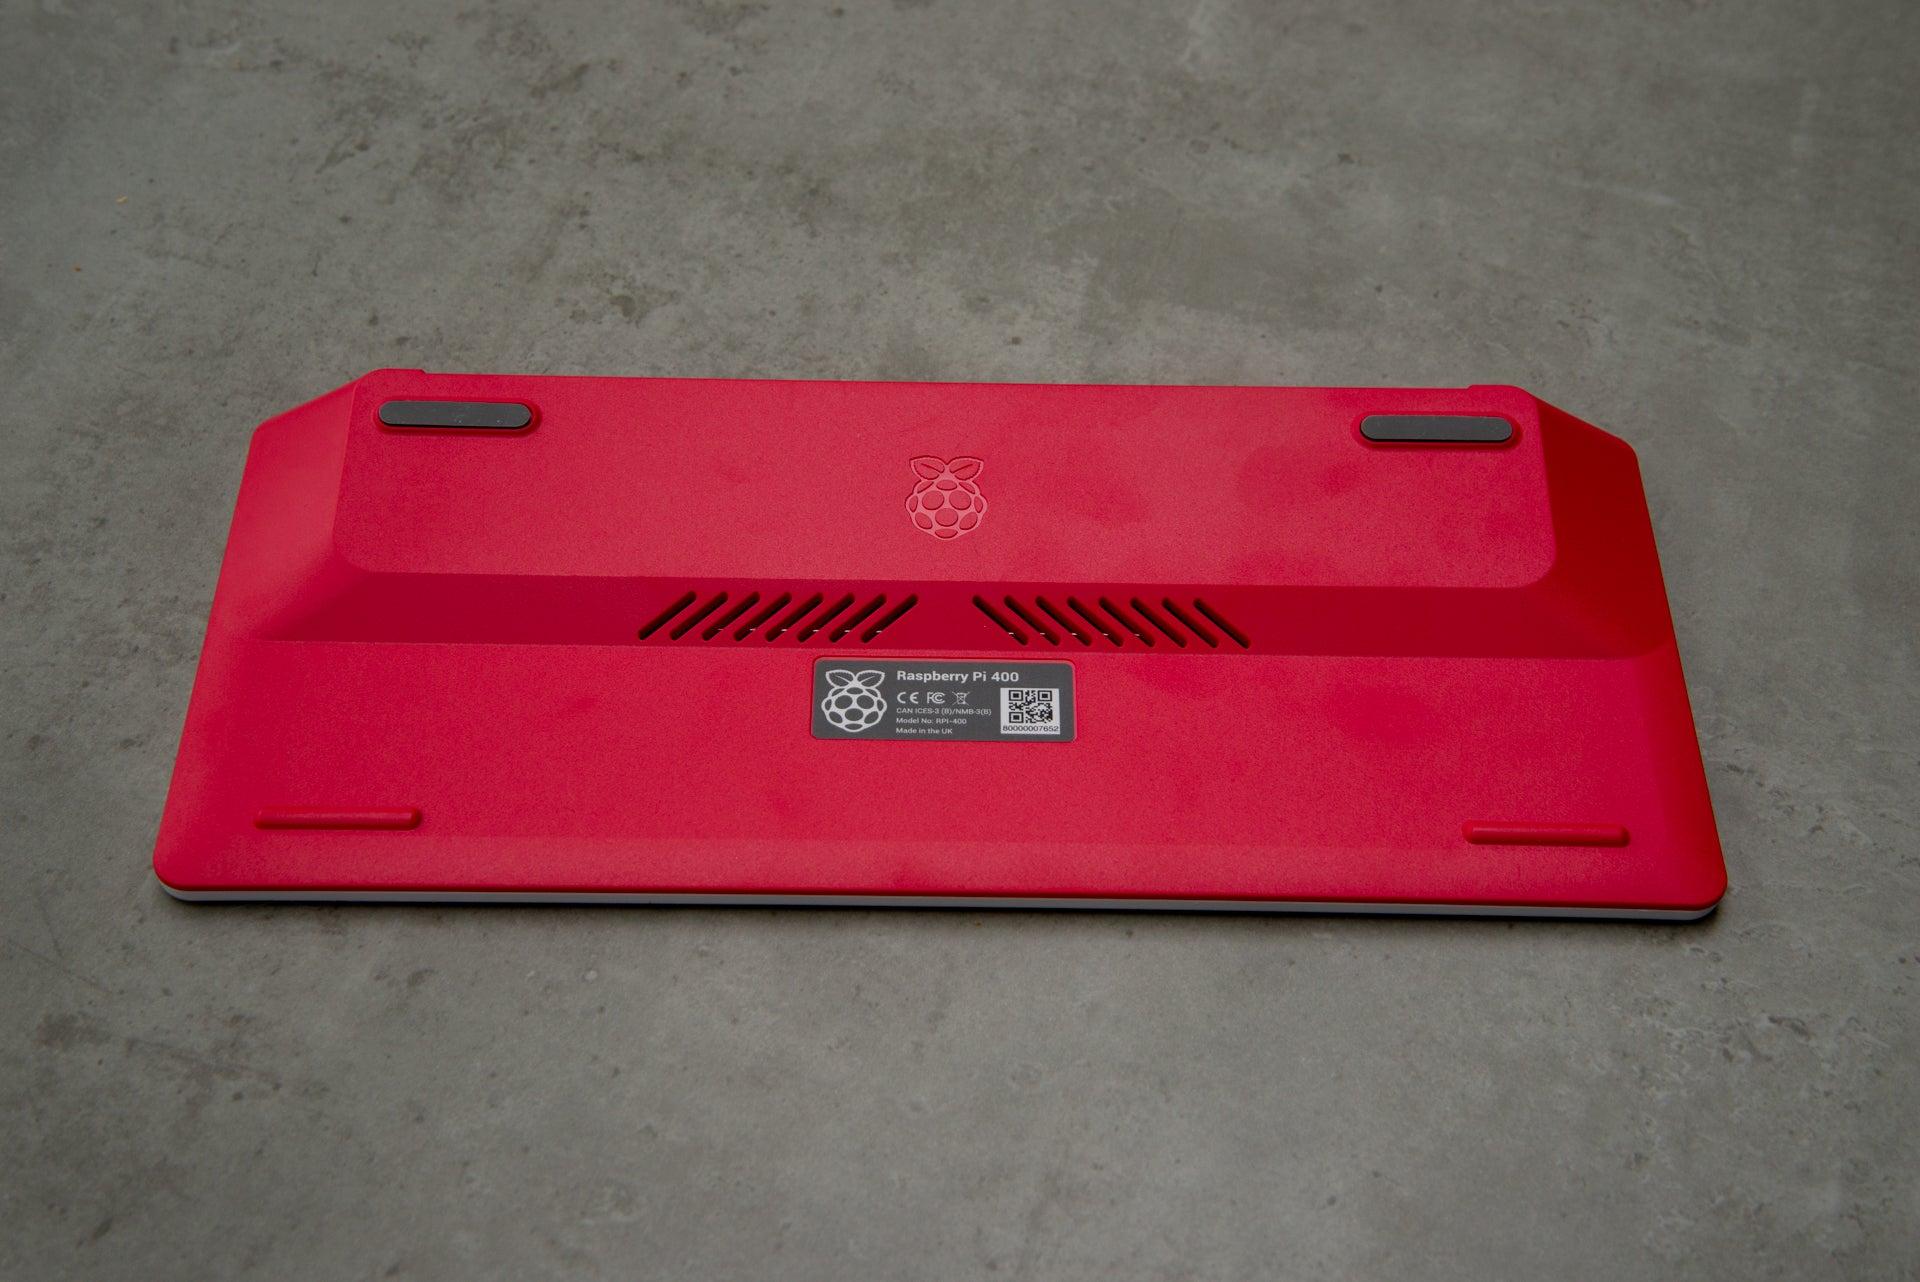 Raspberry Pi 400 underneath